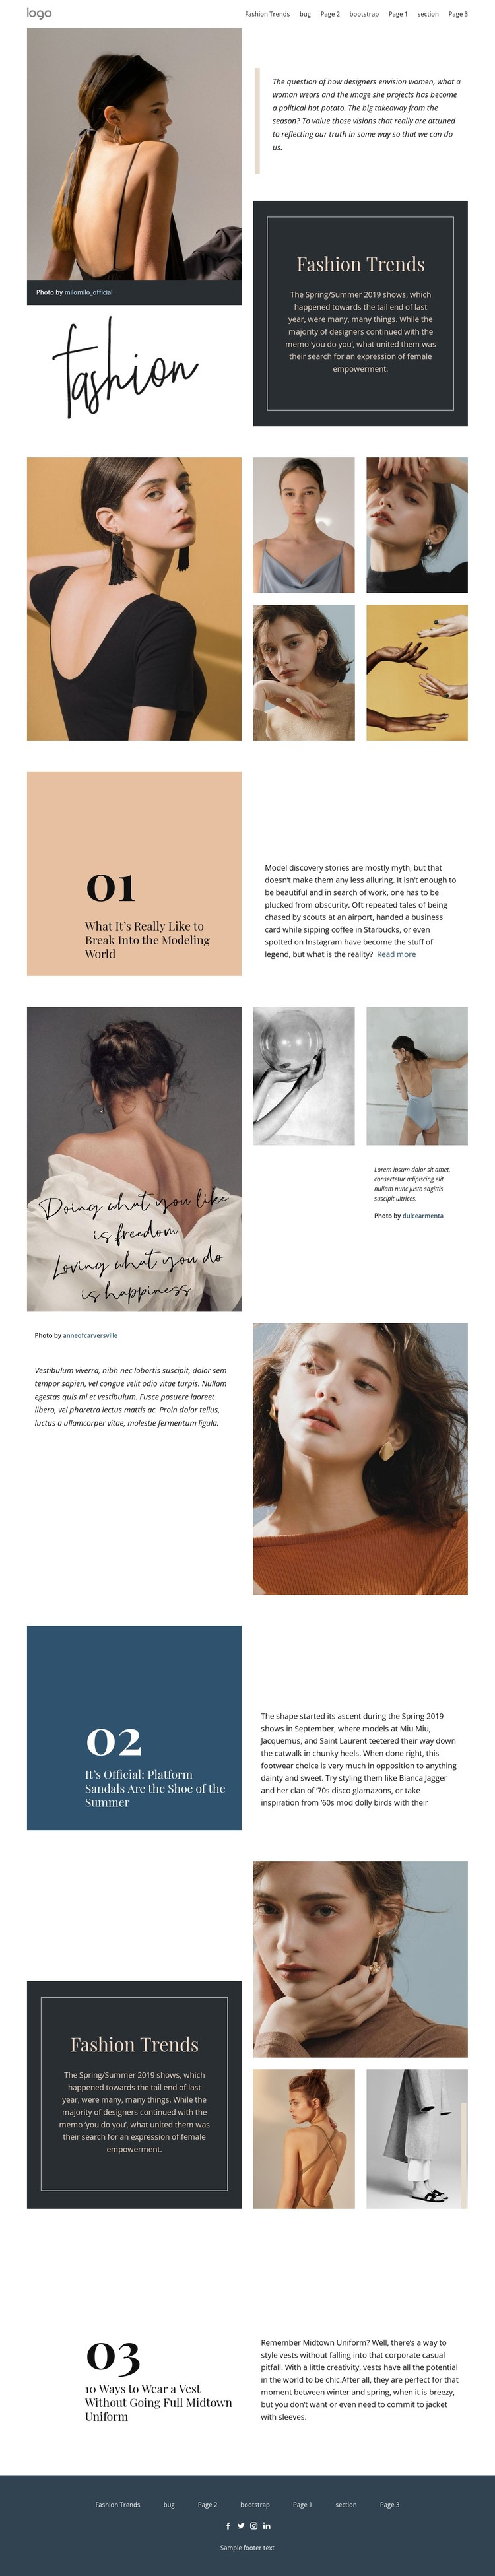 Designer vision of fashion Static Site Generator